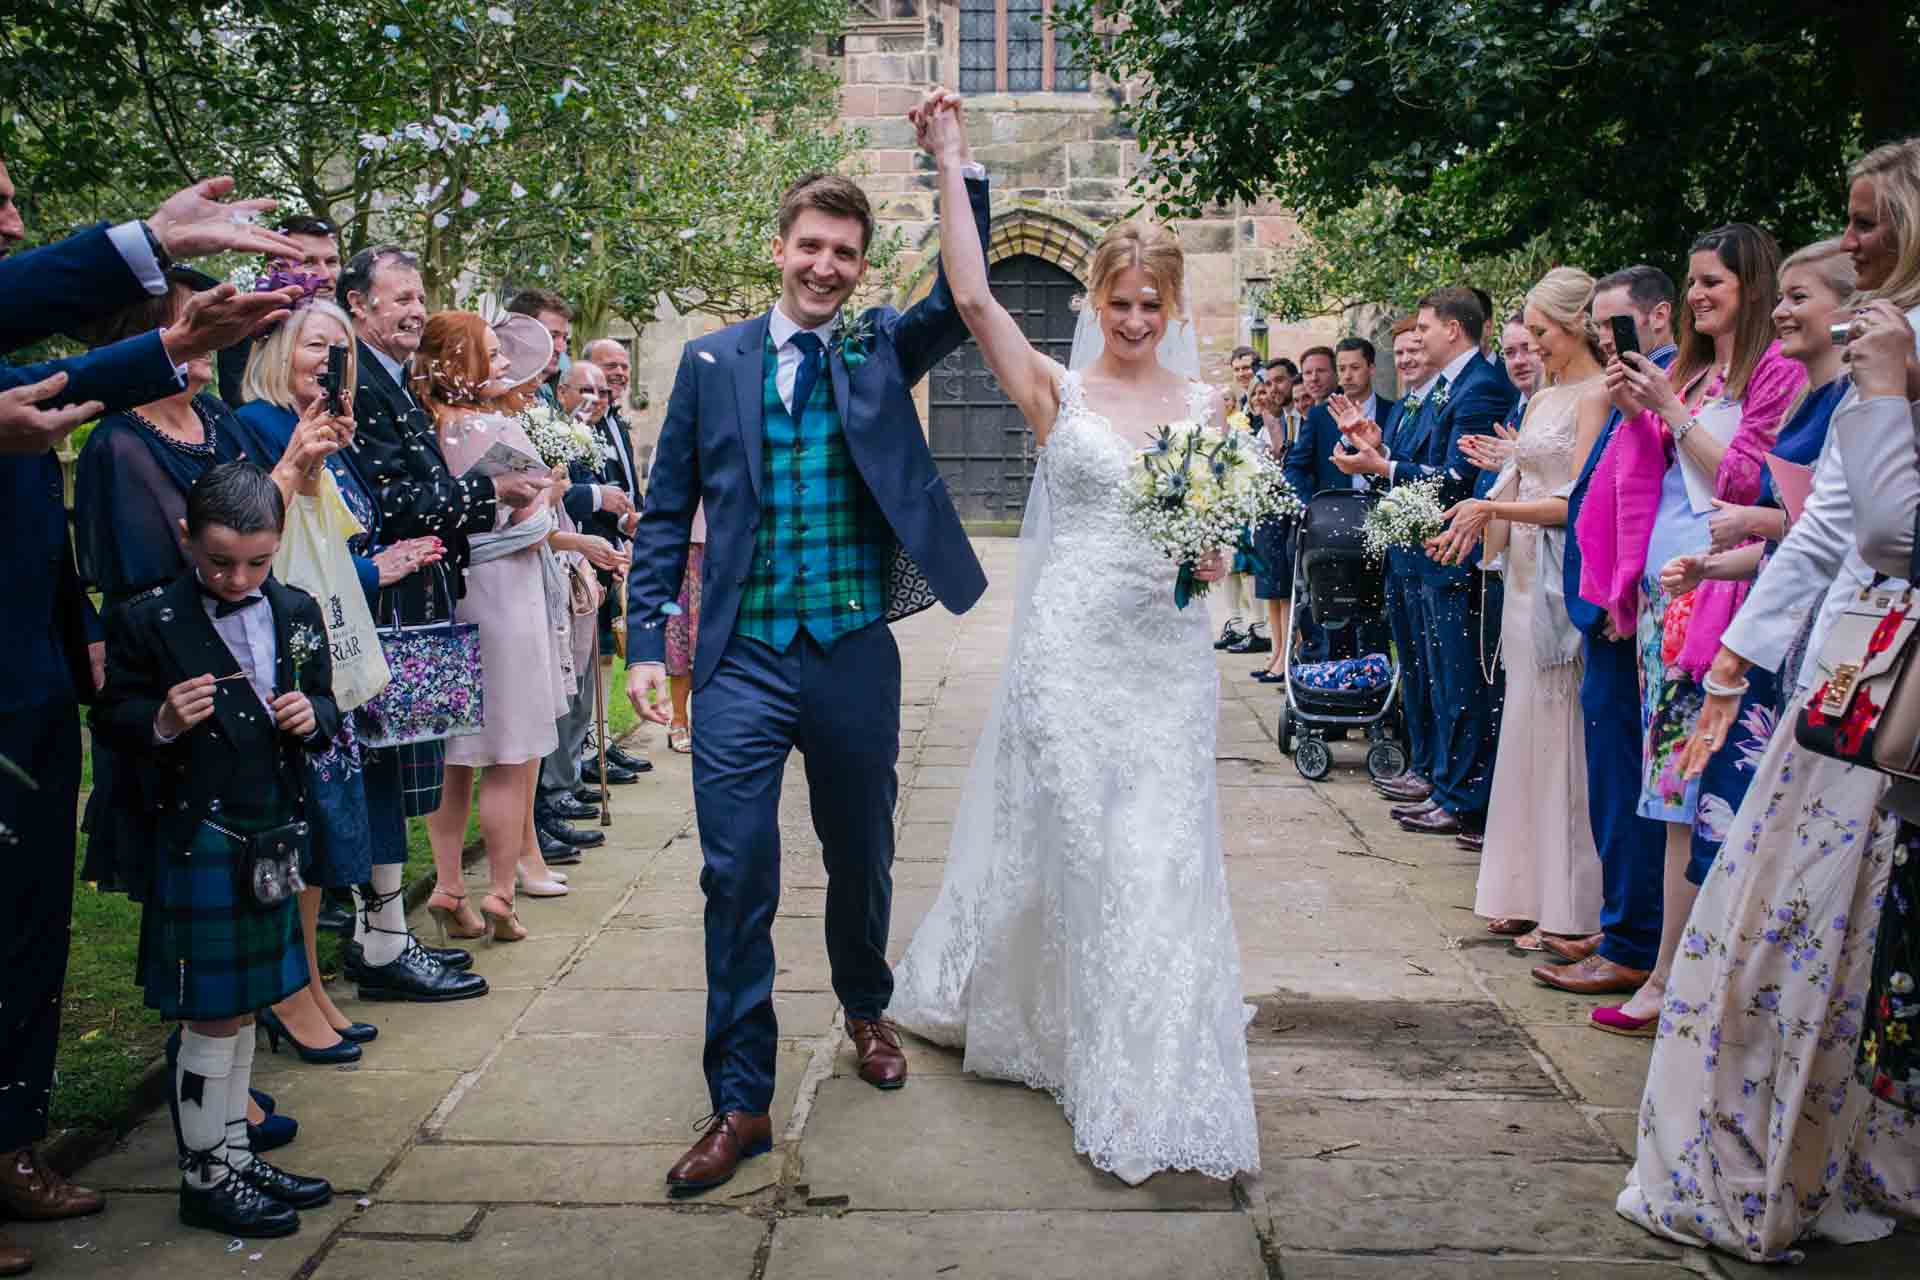 Alison & Joe's Prestbury Church Wedding, Cheshire - Joanna Eardley Photography